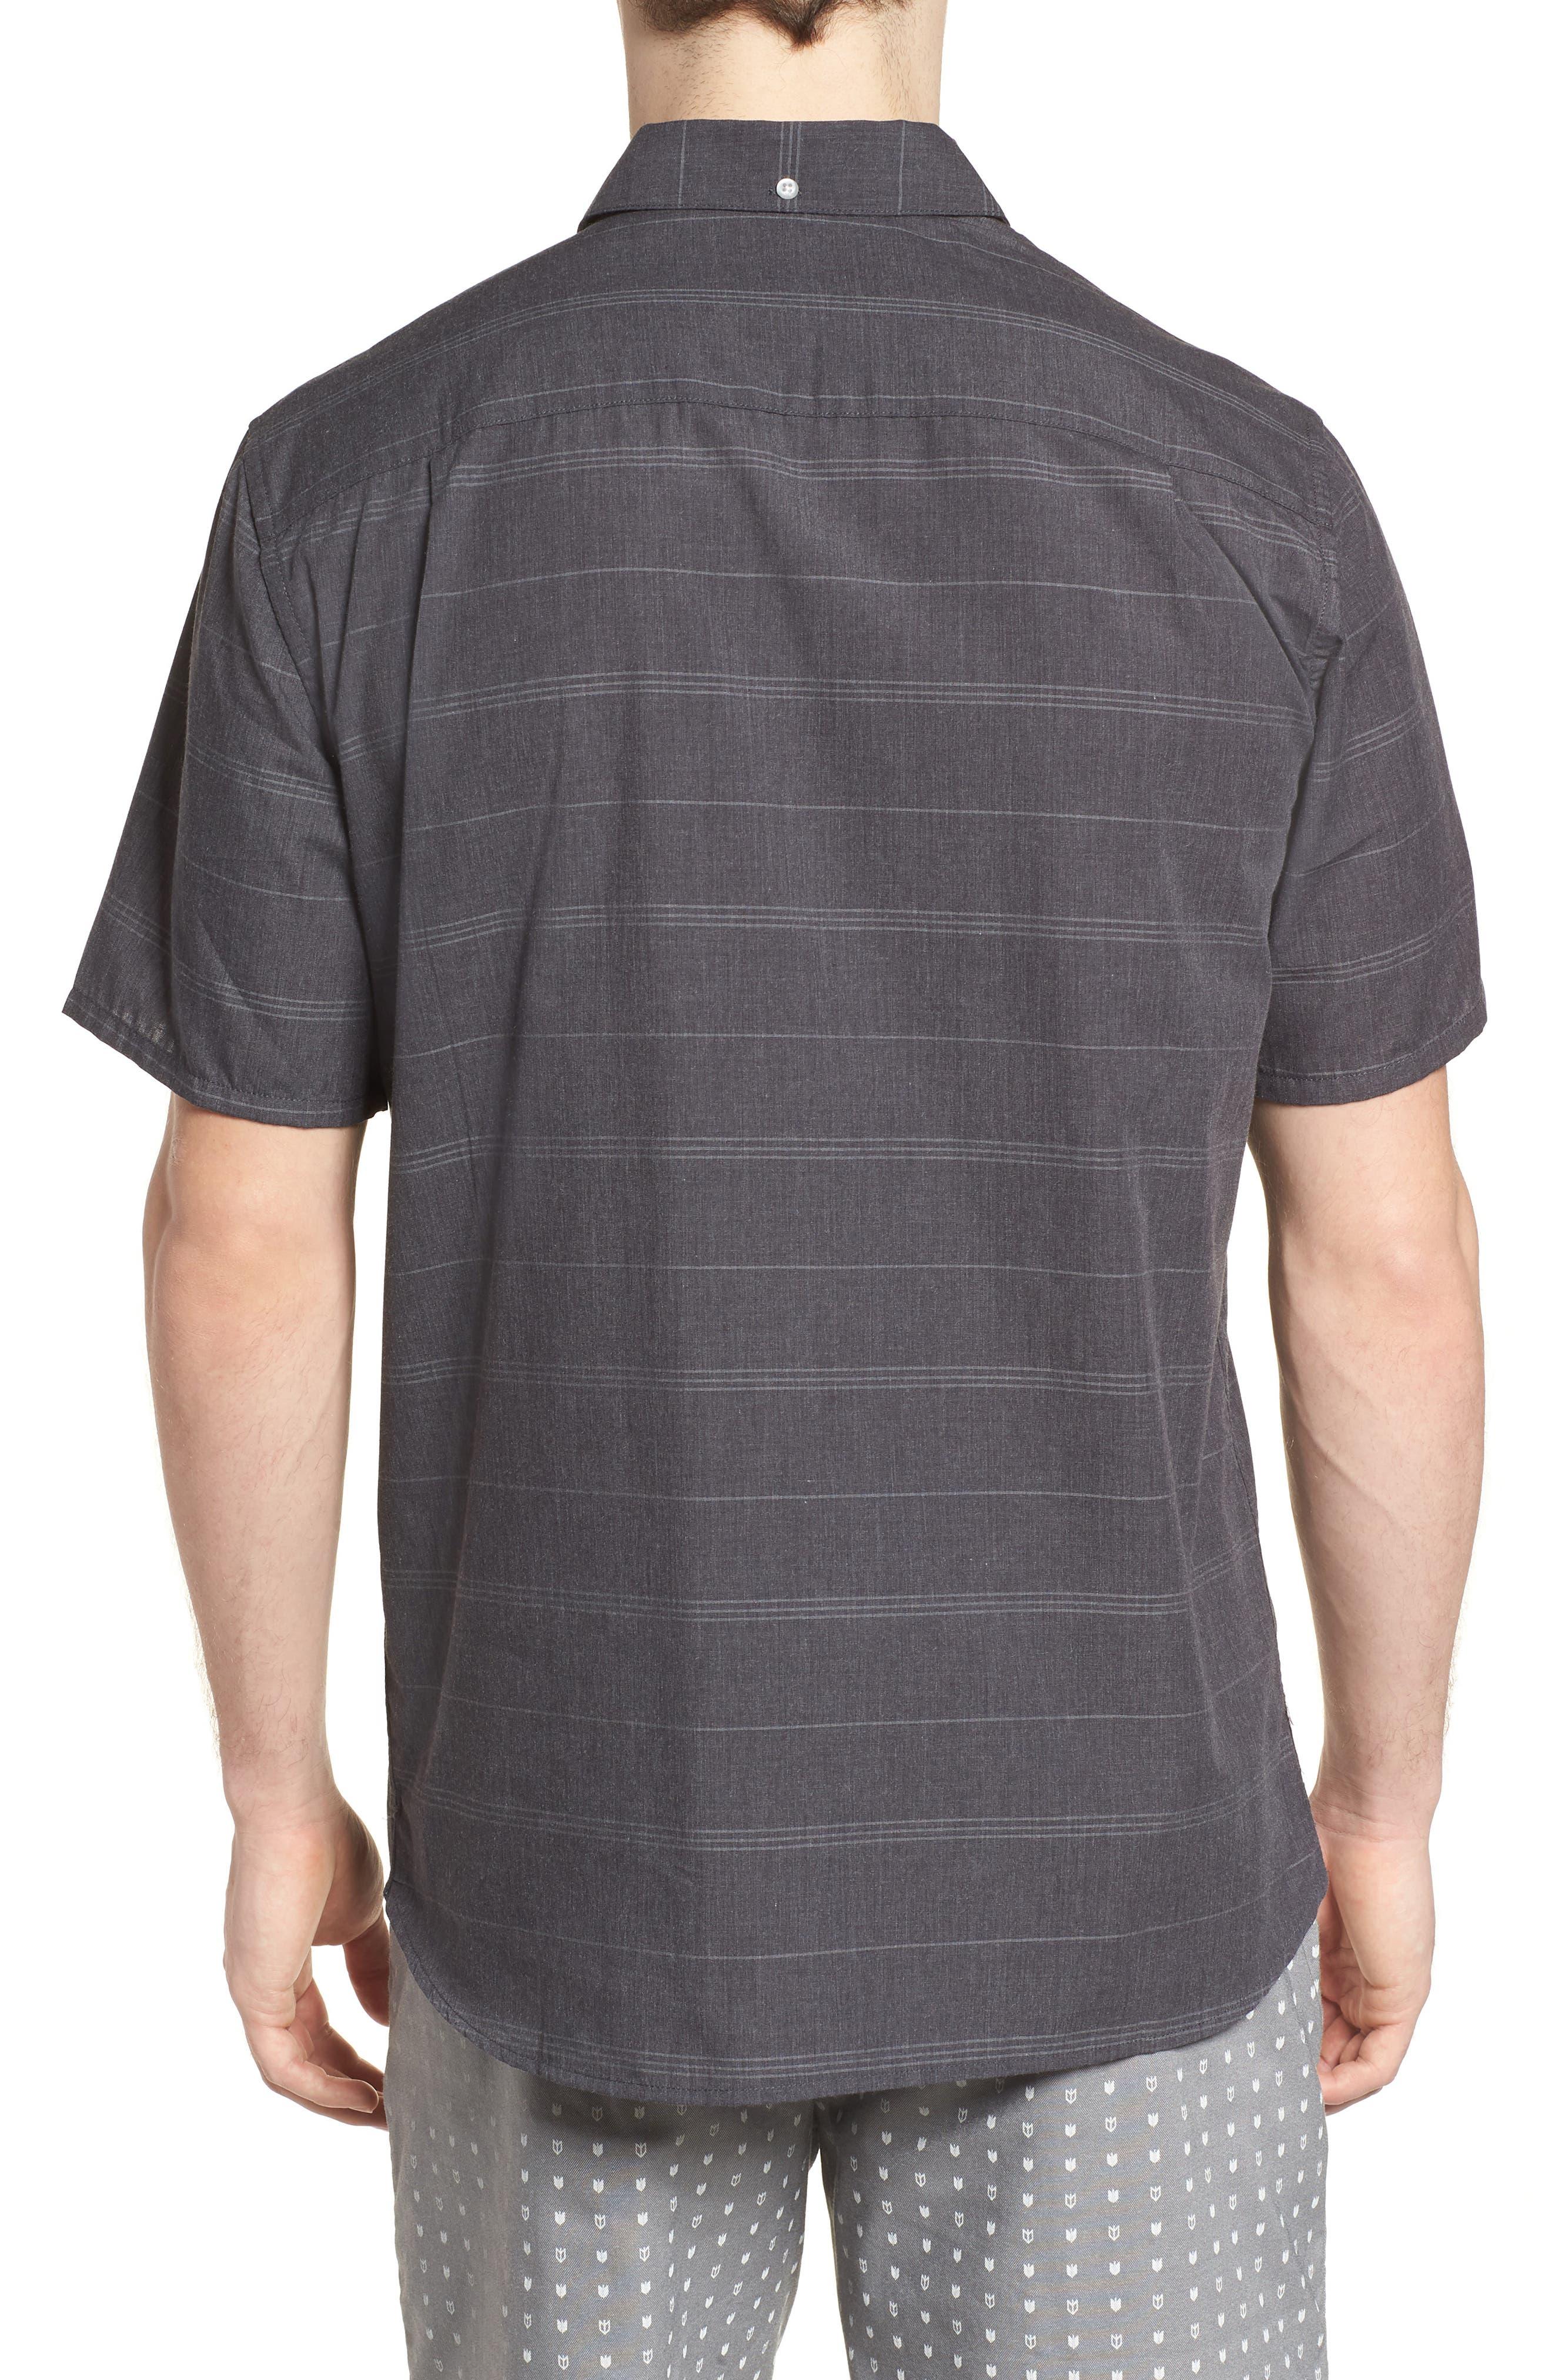 HURLEY,                             Dri-FIT Rhythm Shirt,                             Alternate thumbnail 2, color,                             010